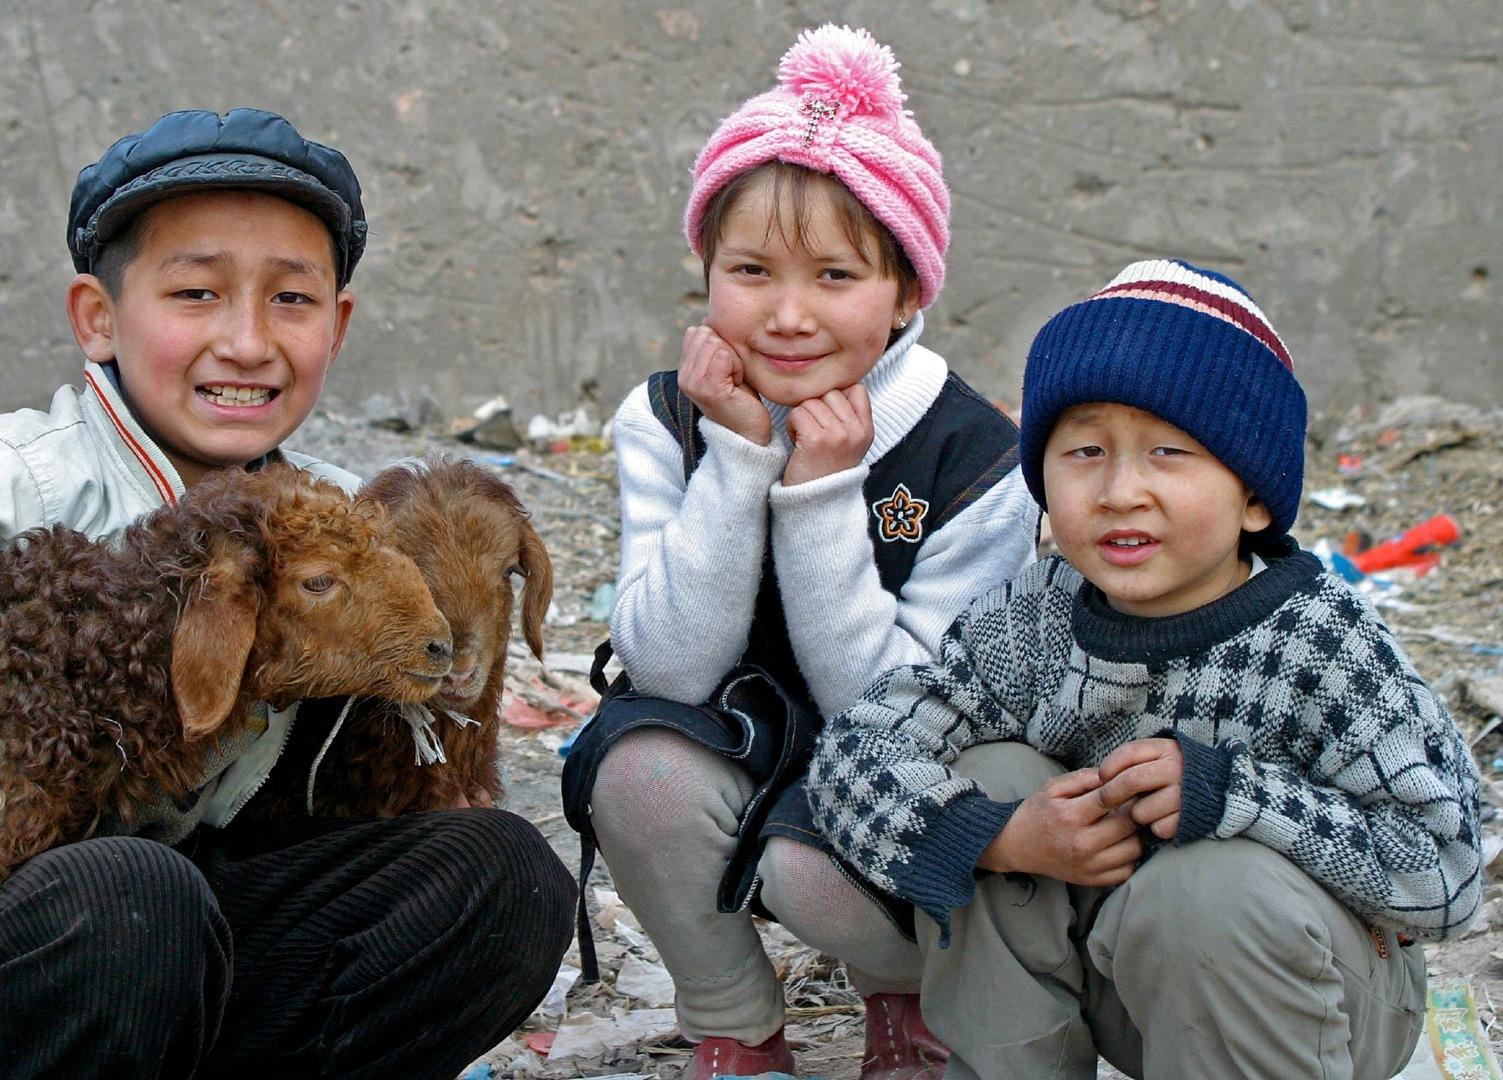 Oeigoerse separatisten verdacht van terrorisme in ... - photo#50